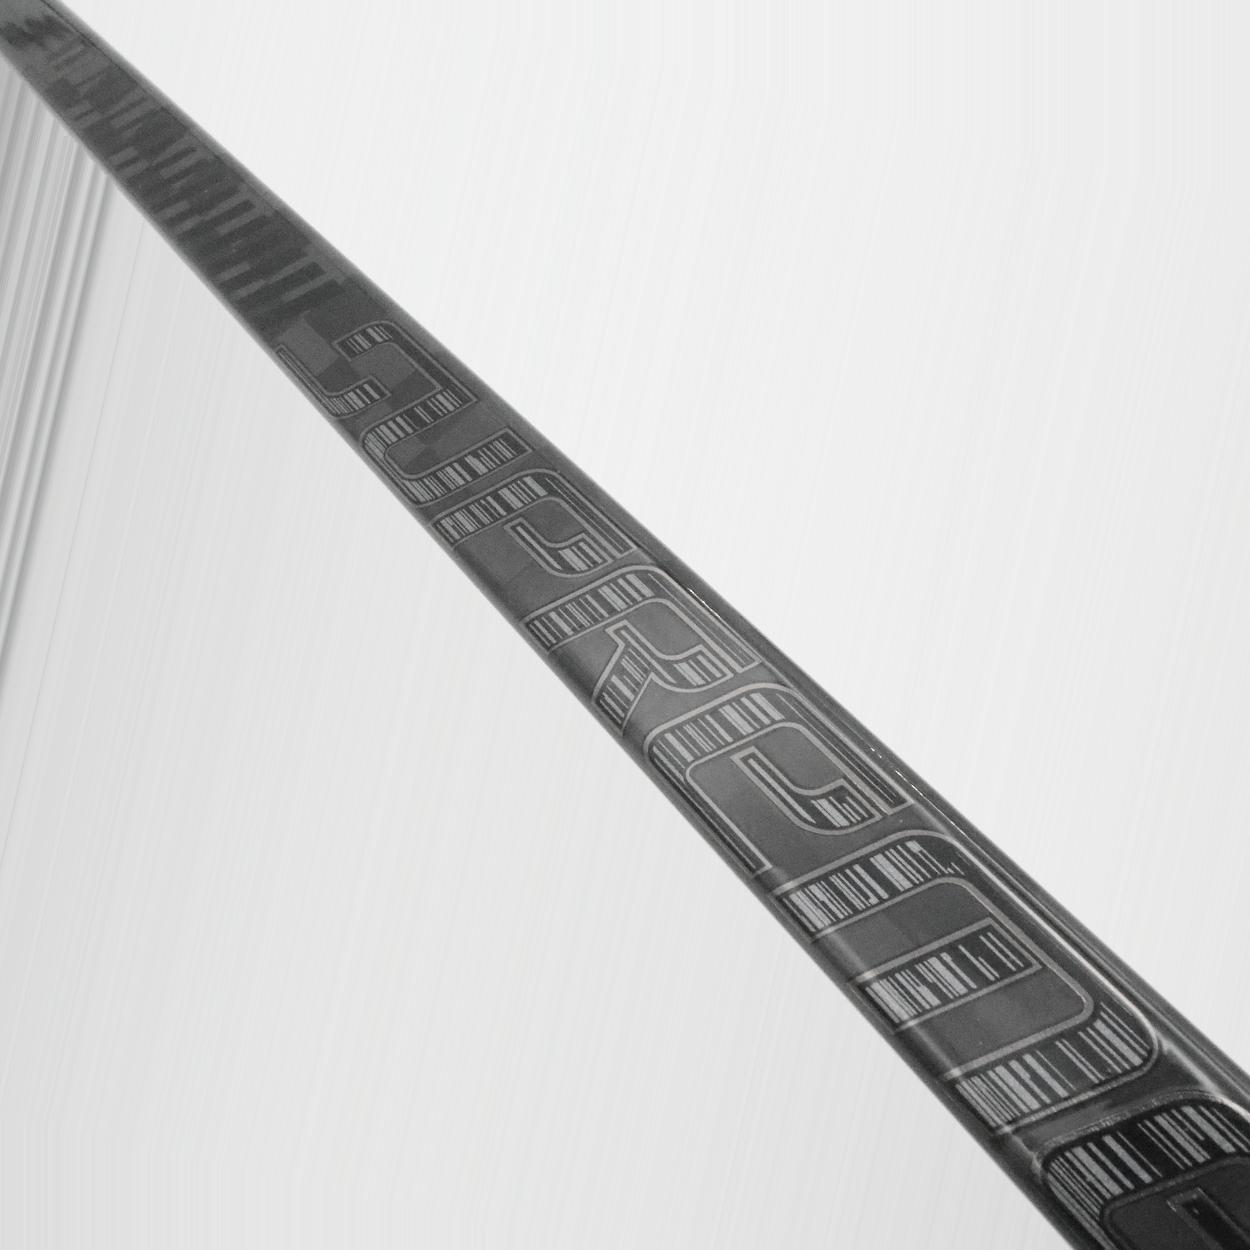 SUPREME 2S PRO Griptac Stick Senior